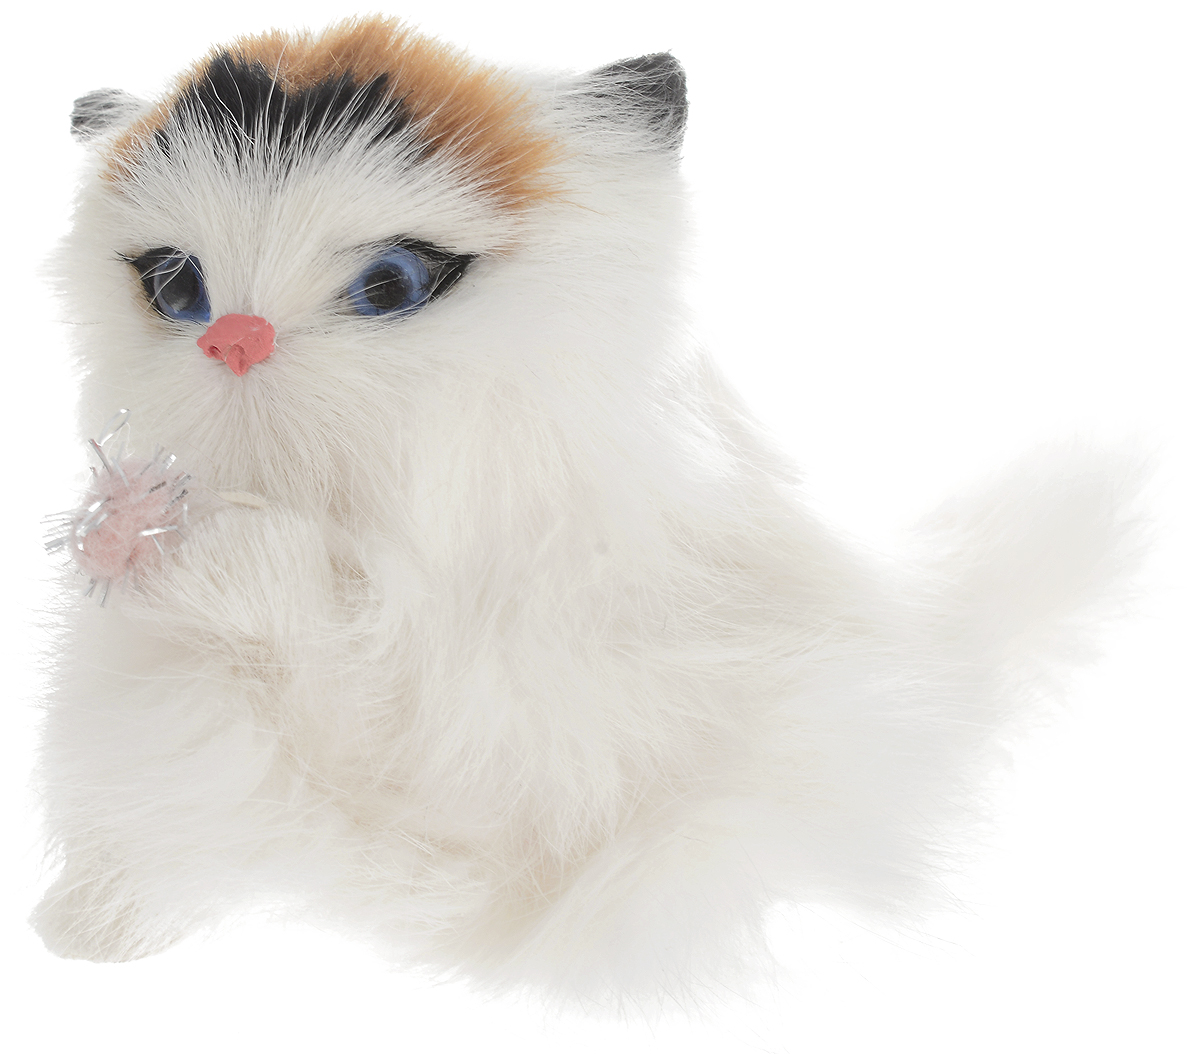 Vebtoy Фигурка Котенок с клубочком цвет белый C212 vebtoy фигурка котенок сидящий цвет белый c226